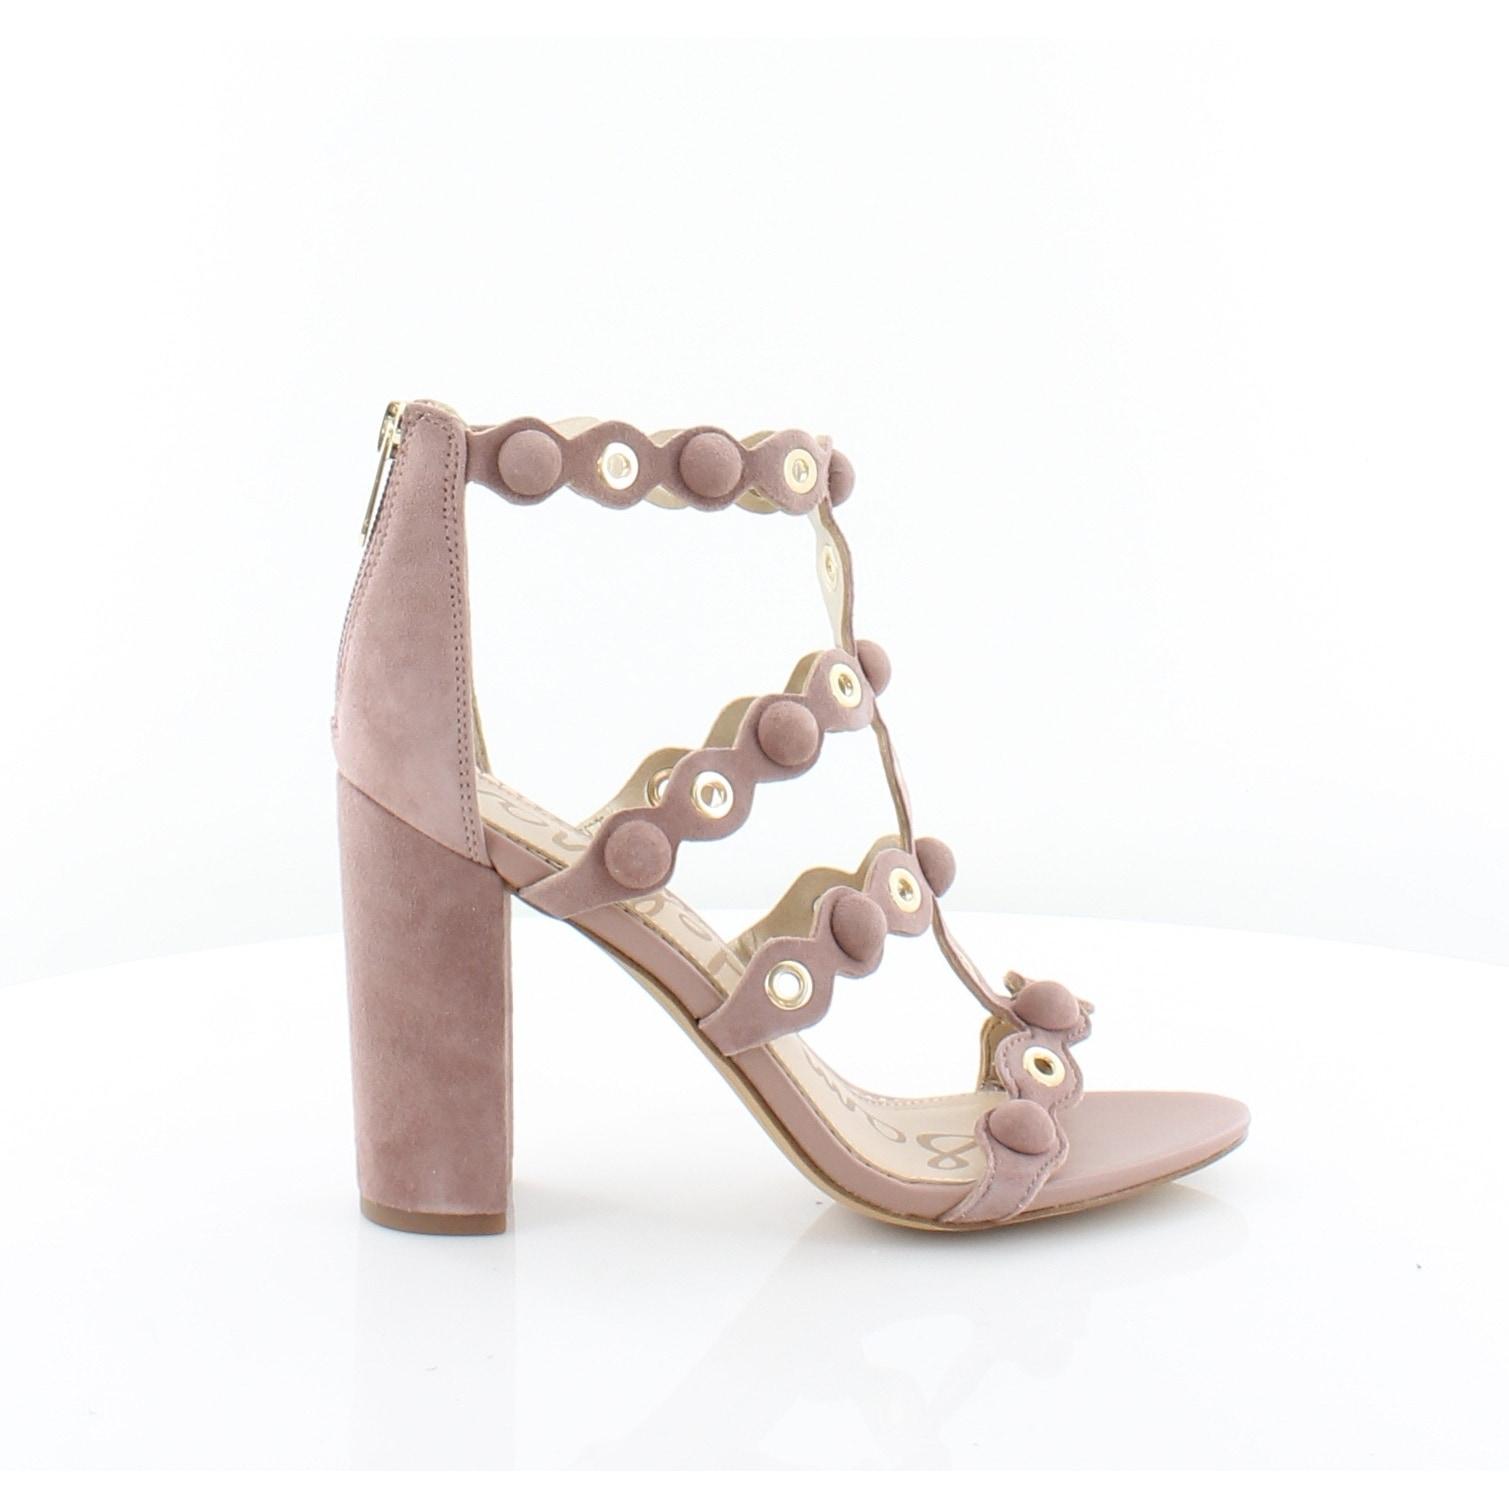 3c1795bc8cf8 Shop Sam Edelman Yuli Women s Heels Dusty Rose - 7 - Free Shipping ...